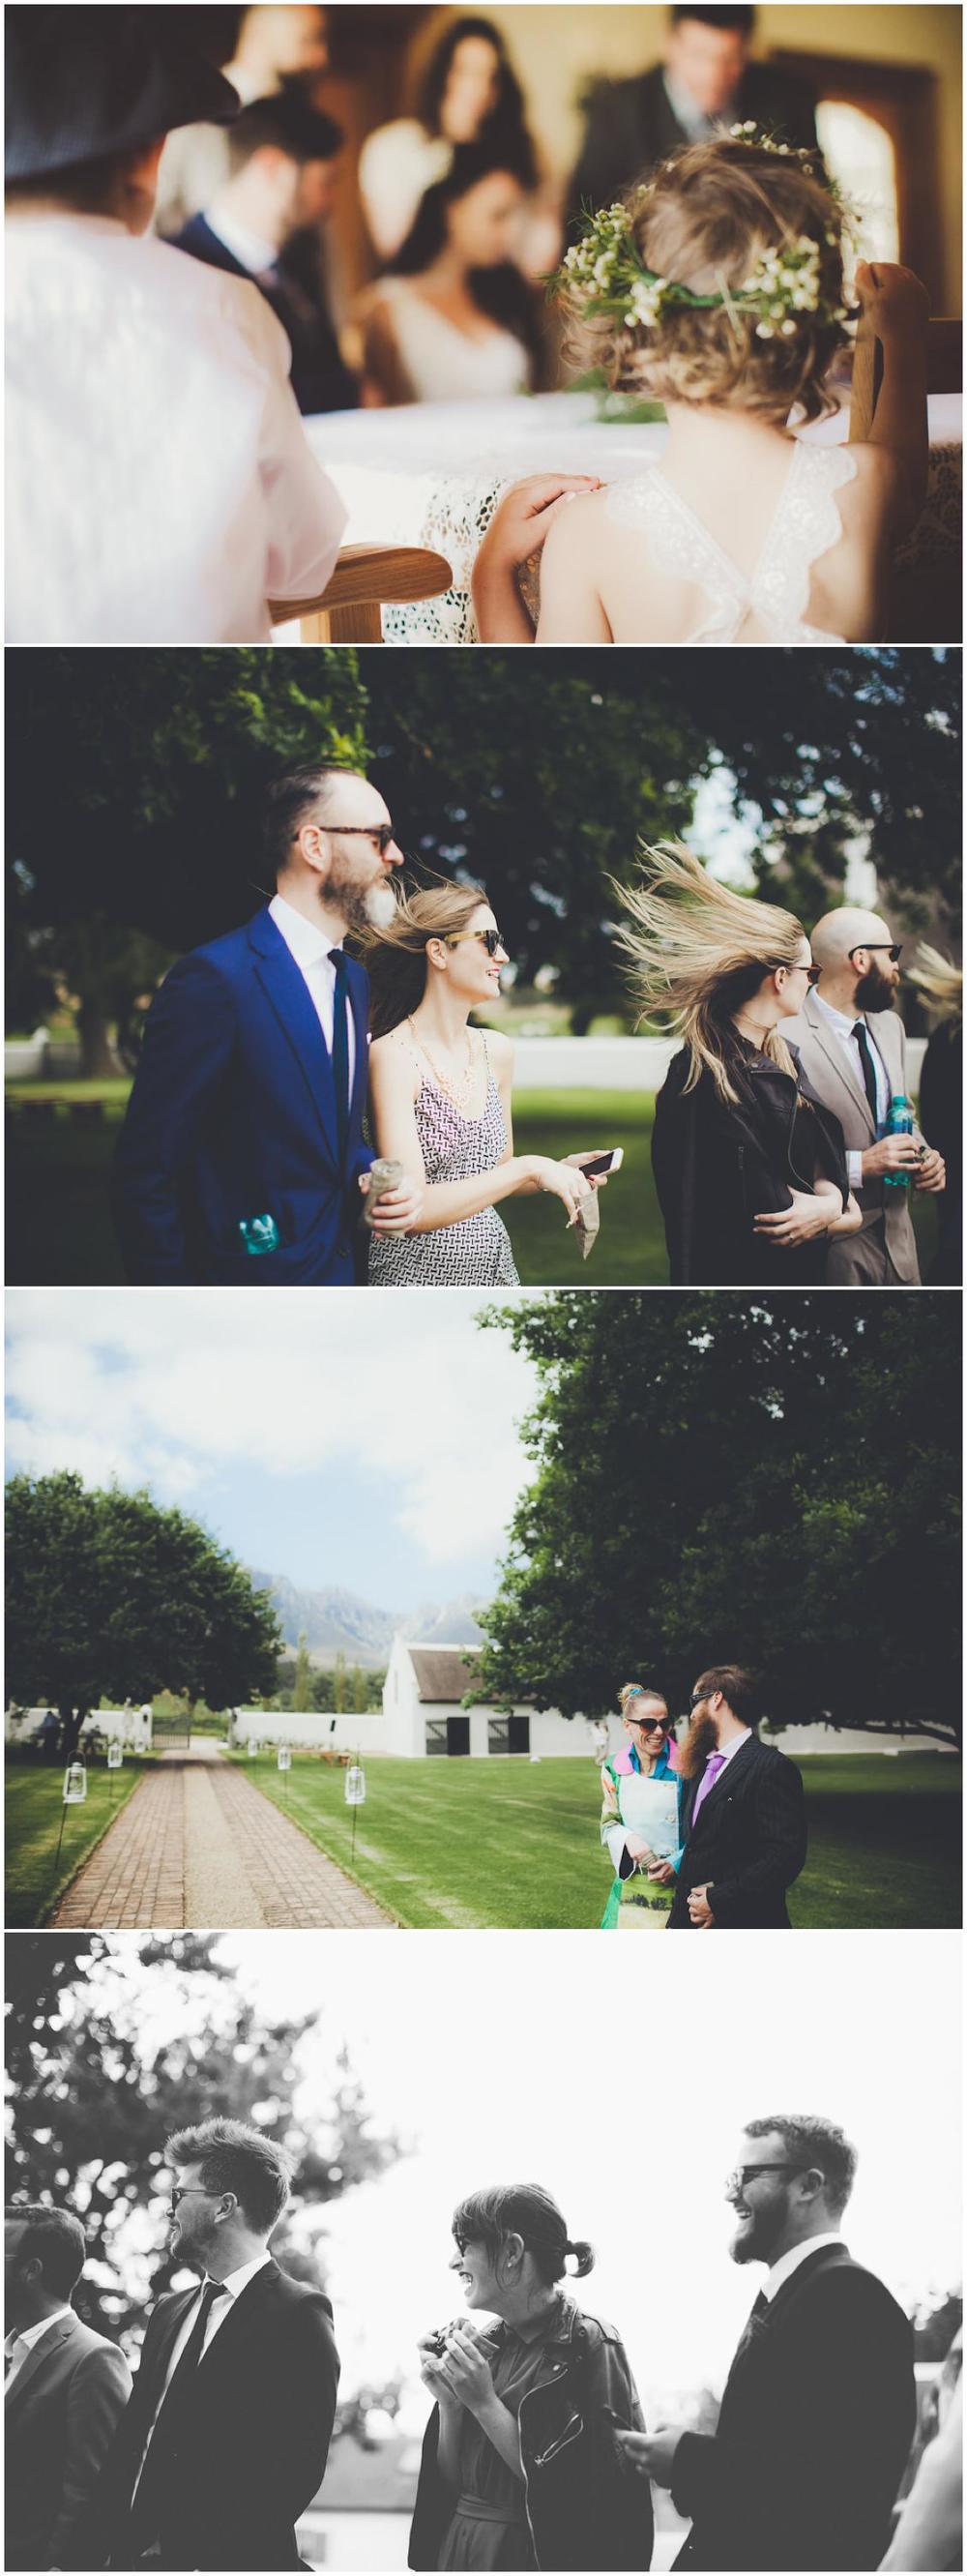 Ruan&Gina_TheOaks_FionaClairPhotography-87.jpg